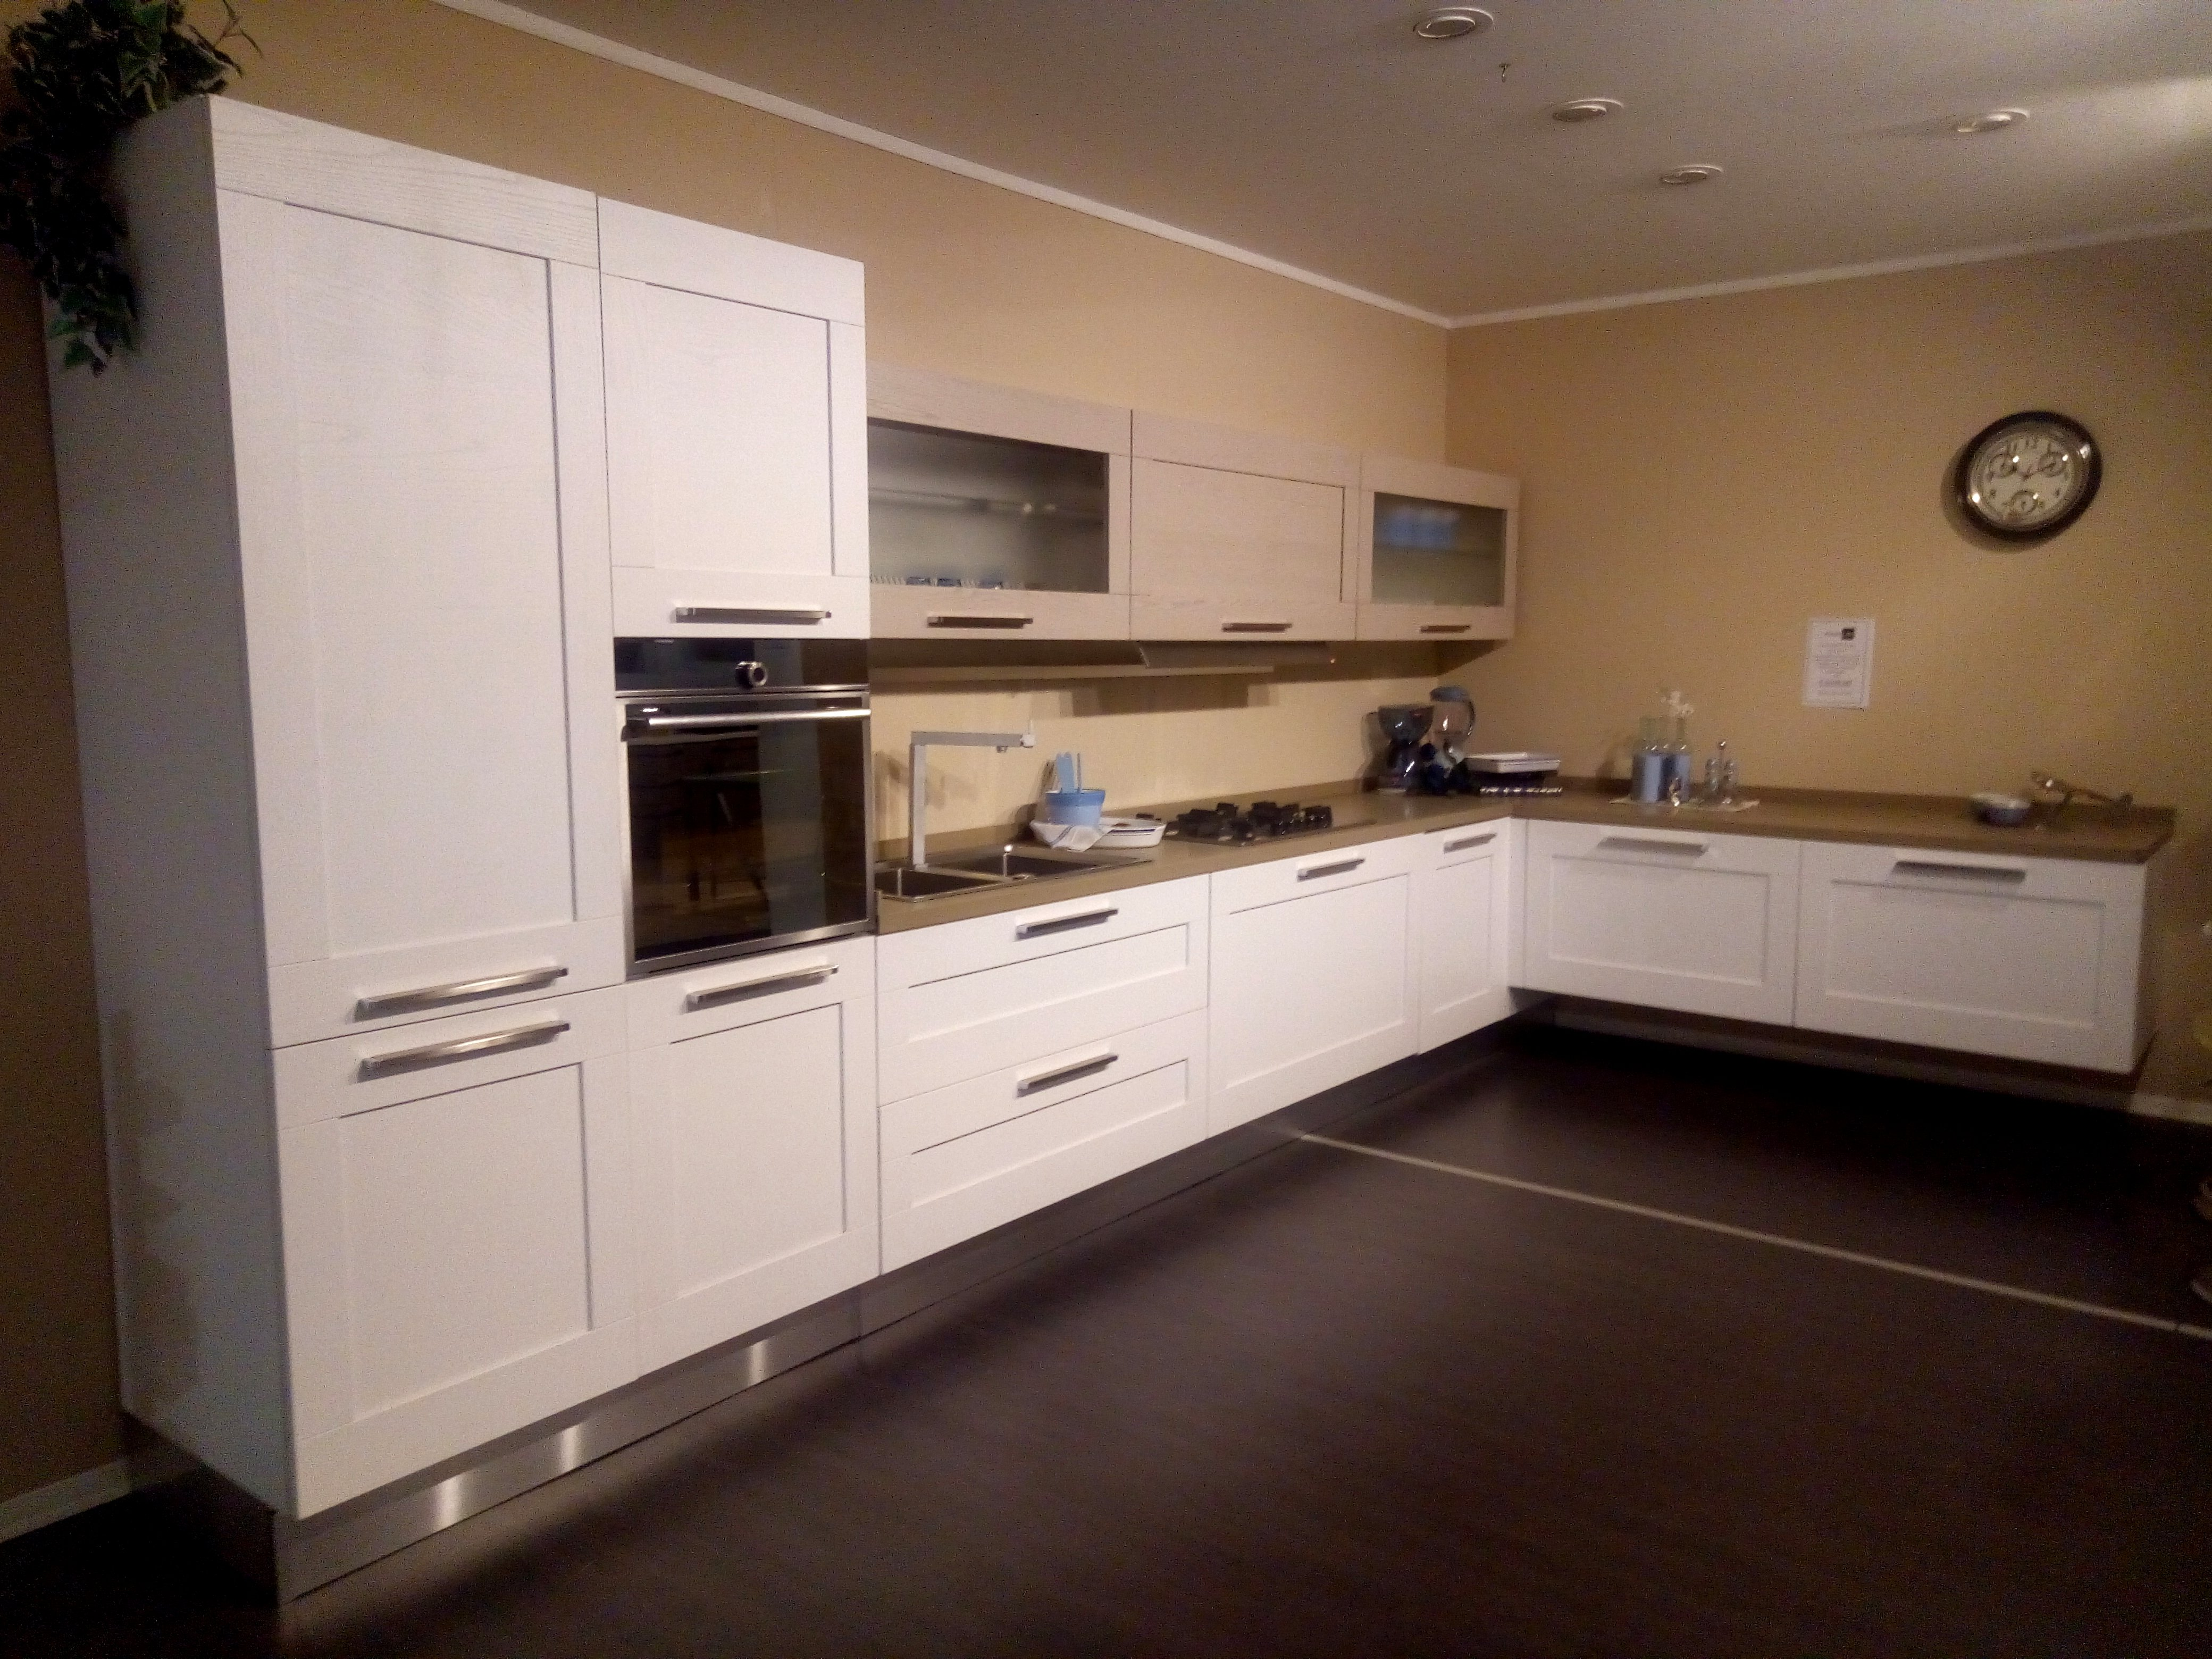 Cucina Lube Gallery Bianco Corda - Vissani Casa